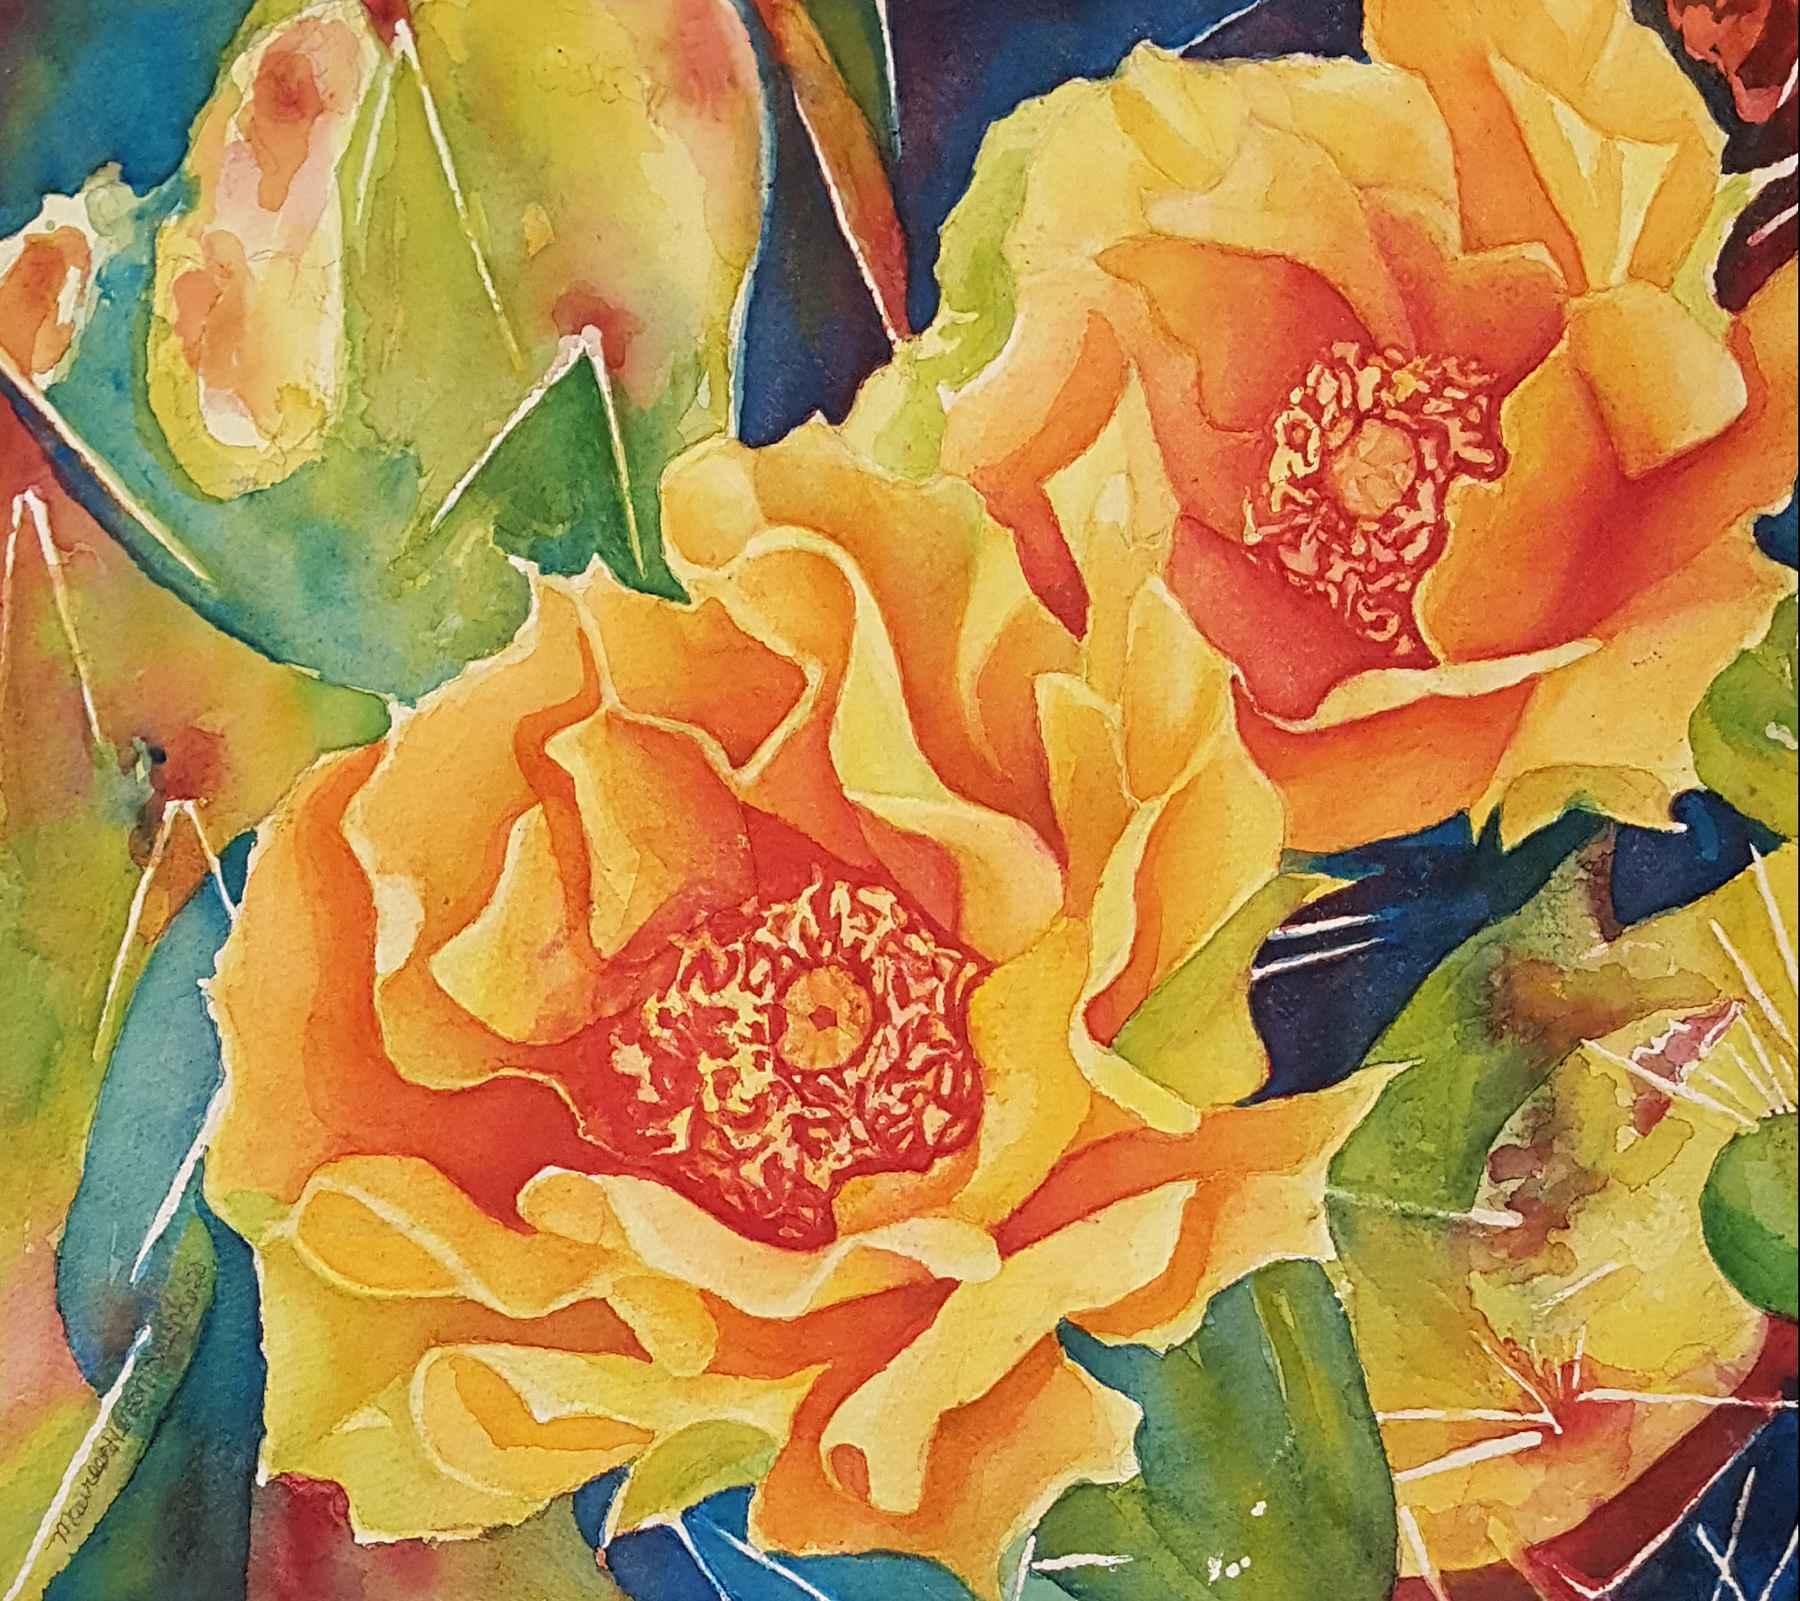 Fiesta De Las Flores by  Maureen Henson-Brunke - Masterpiece Online